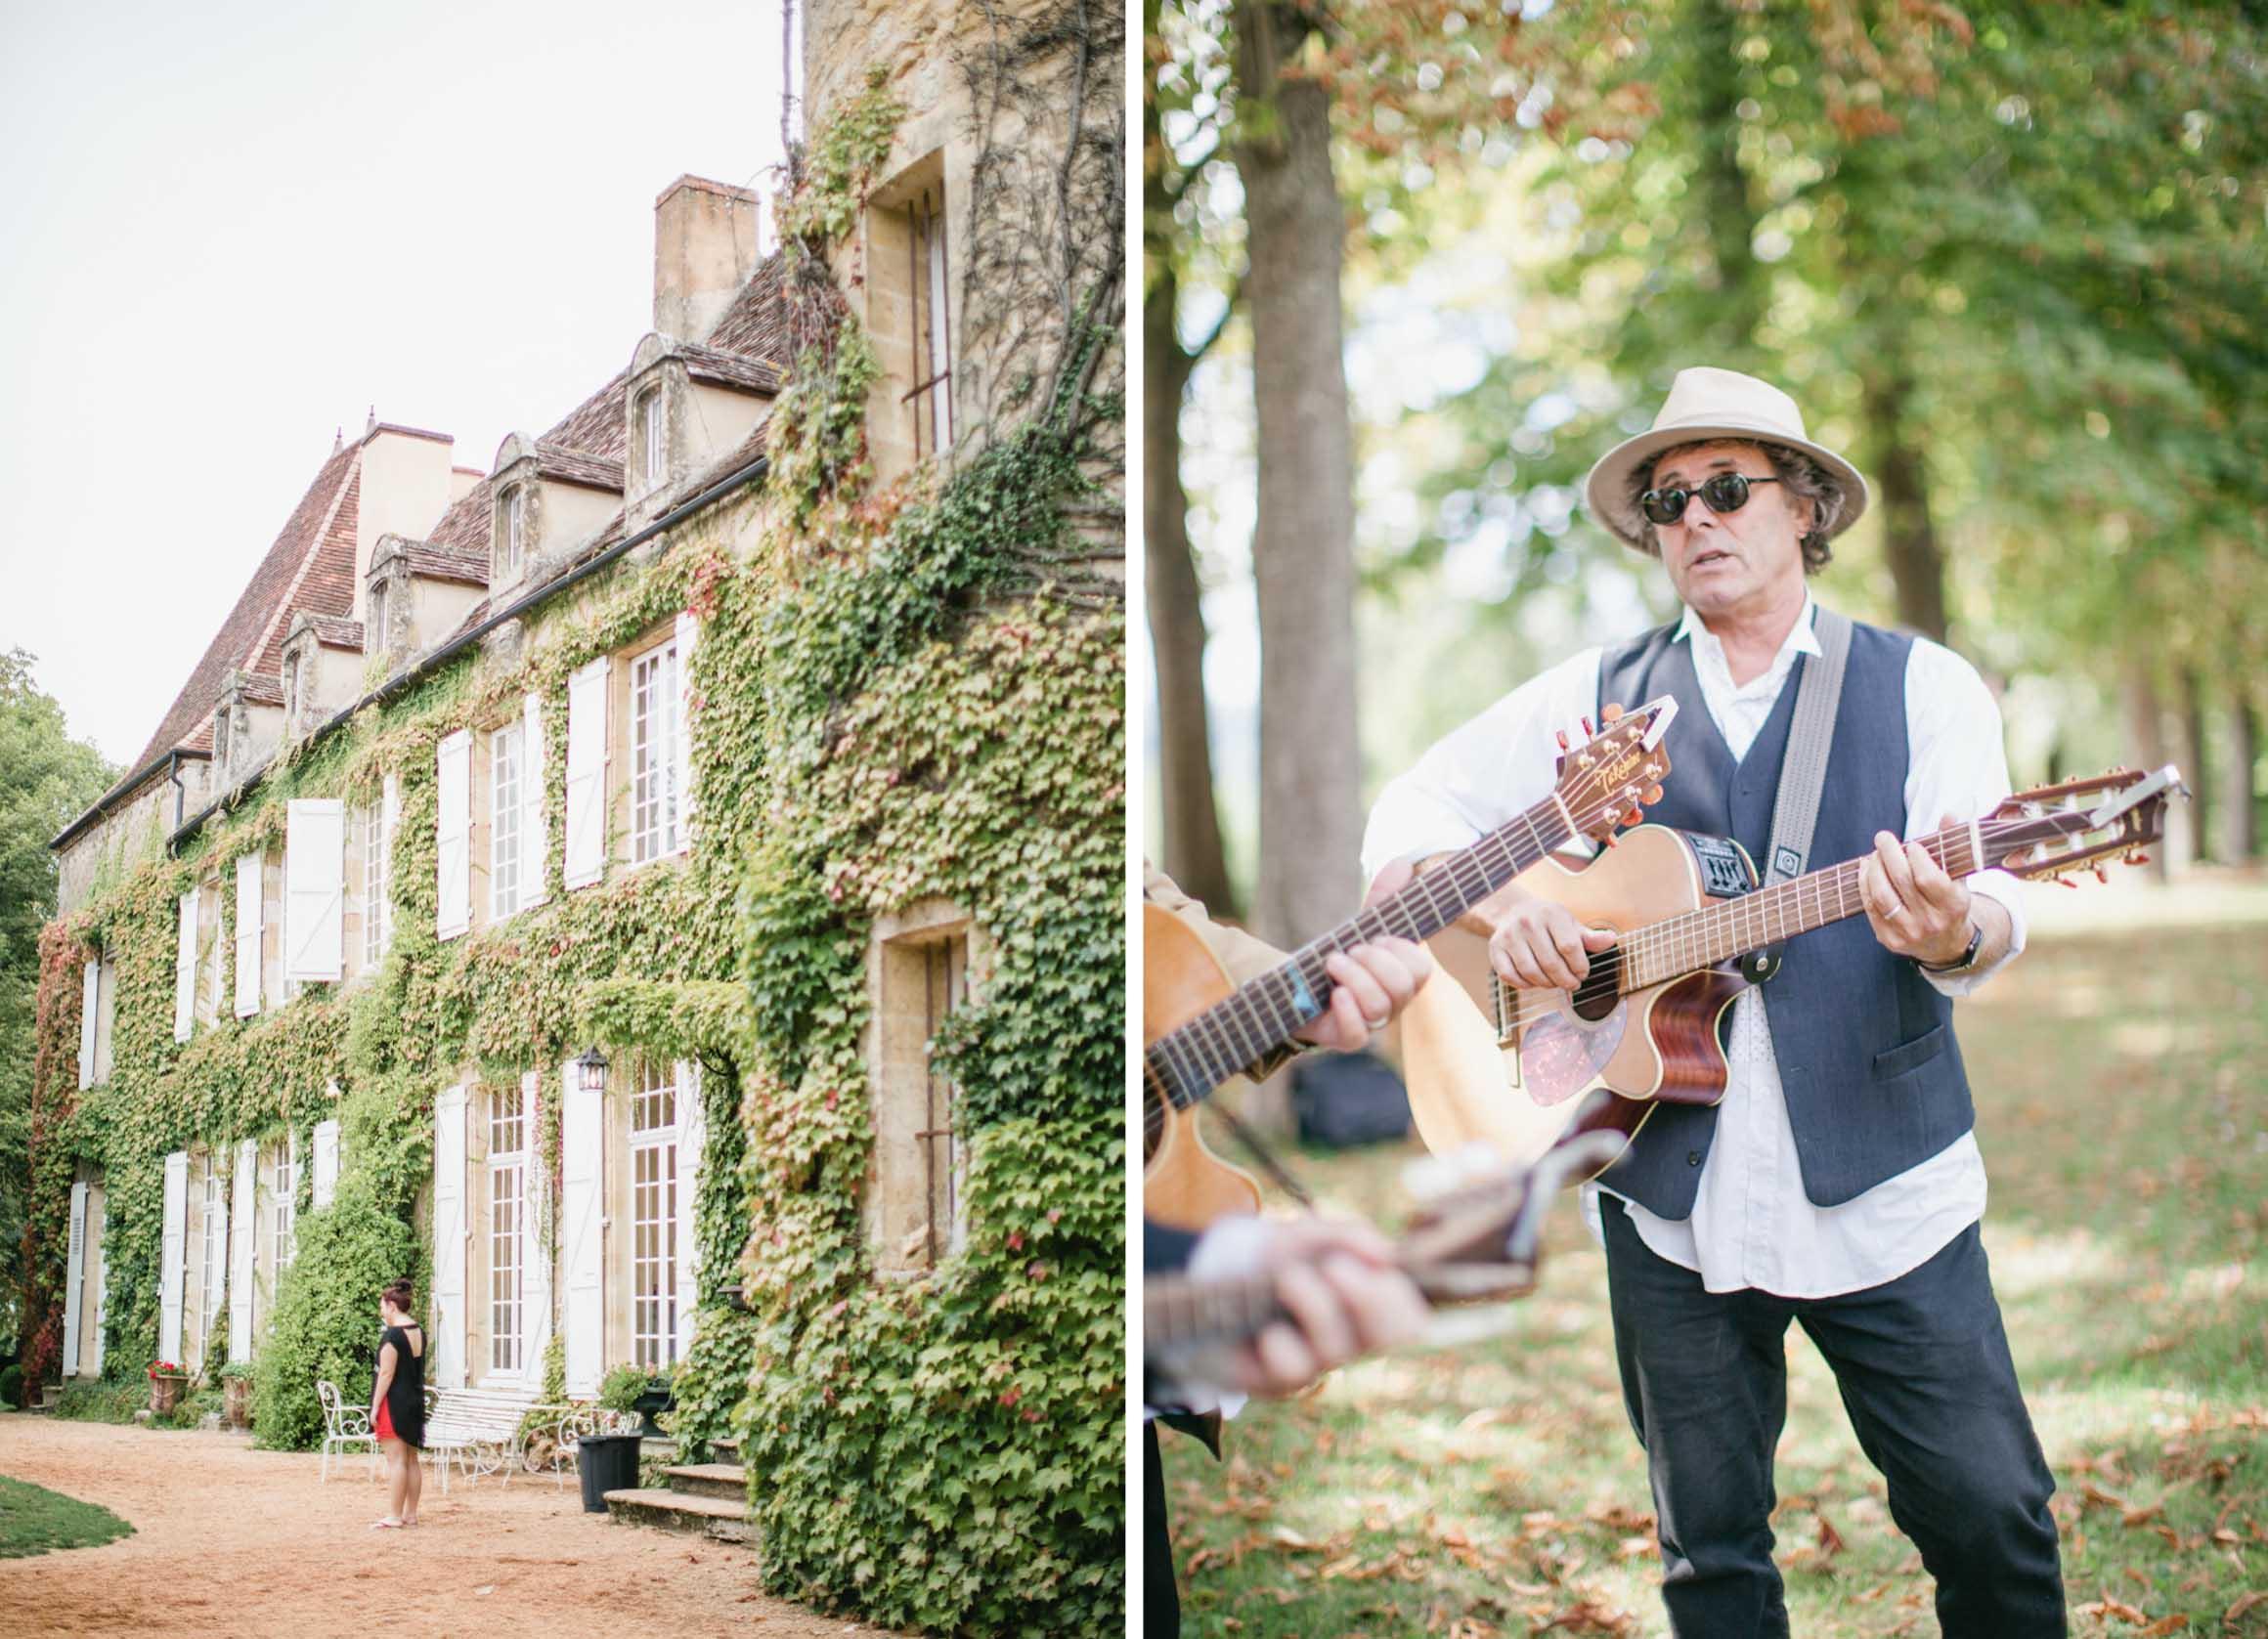 Amy O'Boyle Photography, Destination & UK Fine Art Film Wedding Photographer, Chateau Cazenac Wedding, France Dordogne Wedding Photographer 2.jpg